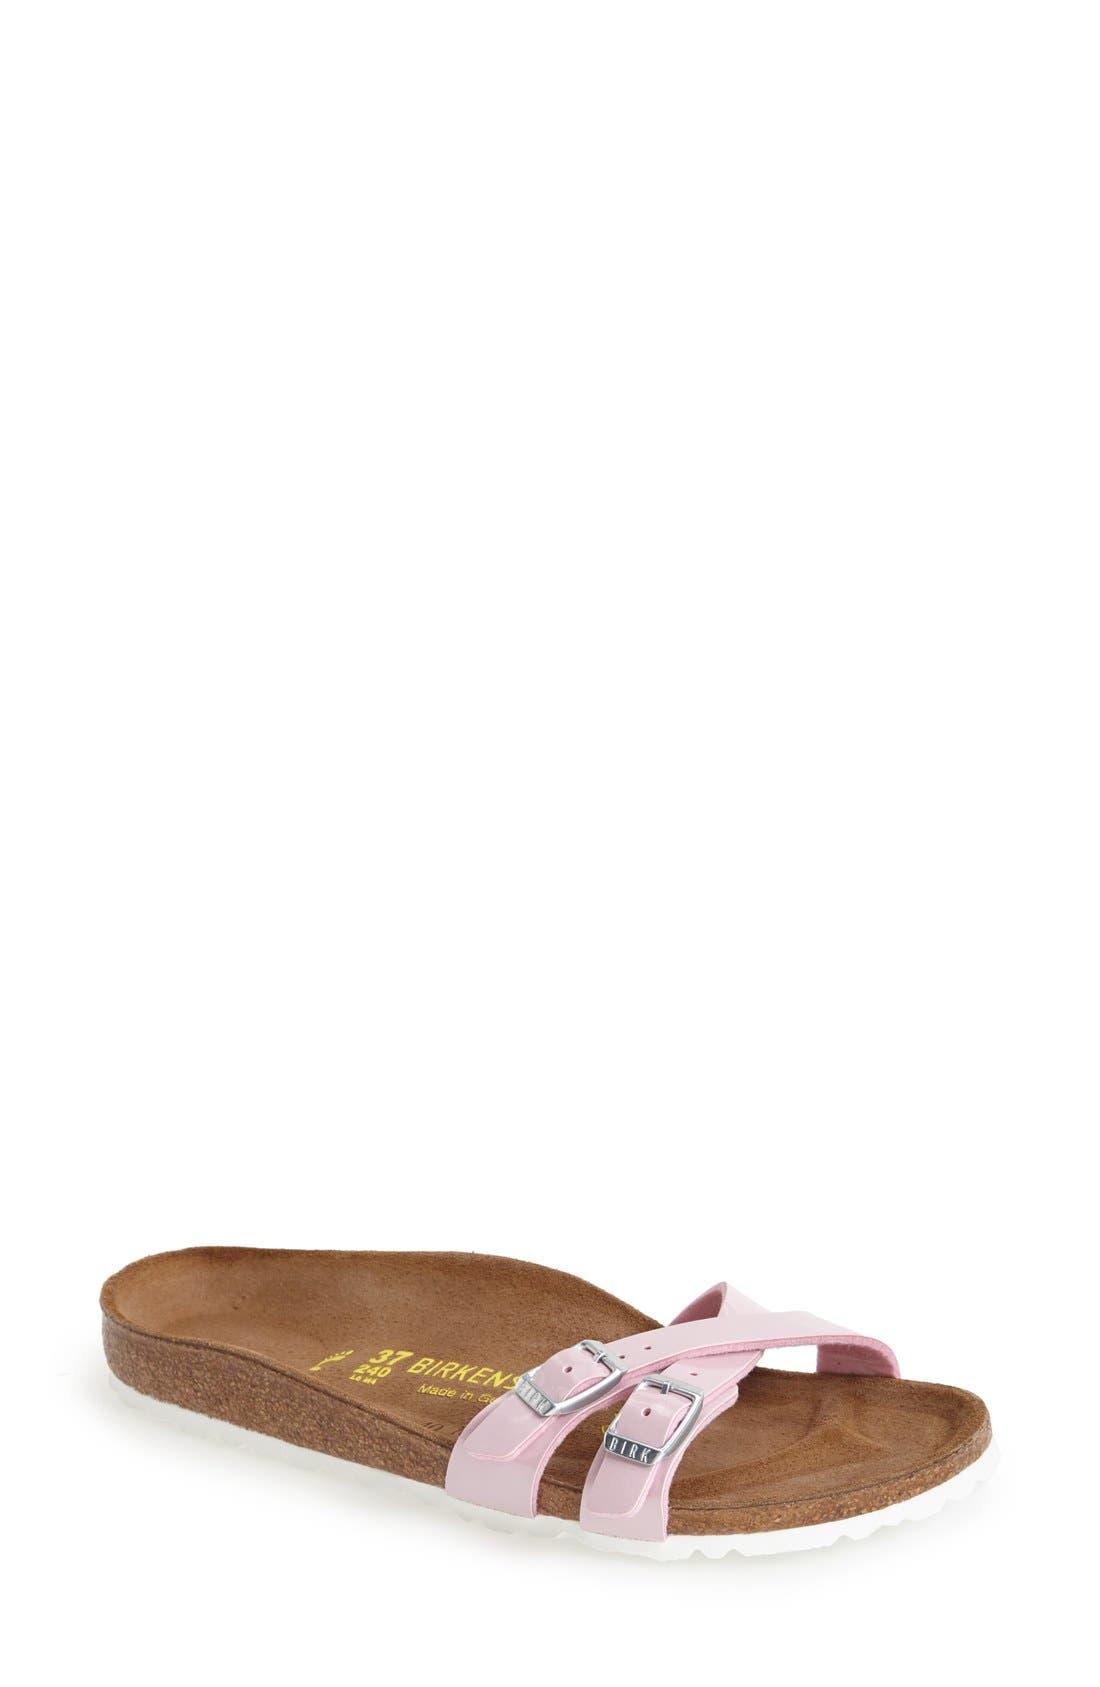 Alternate Image 1 Selected - Birkenstock 'Almere' Slide Sandal (Women)